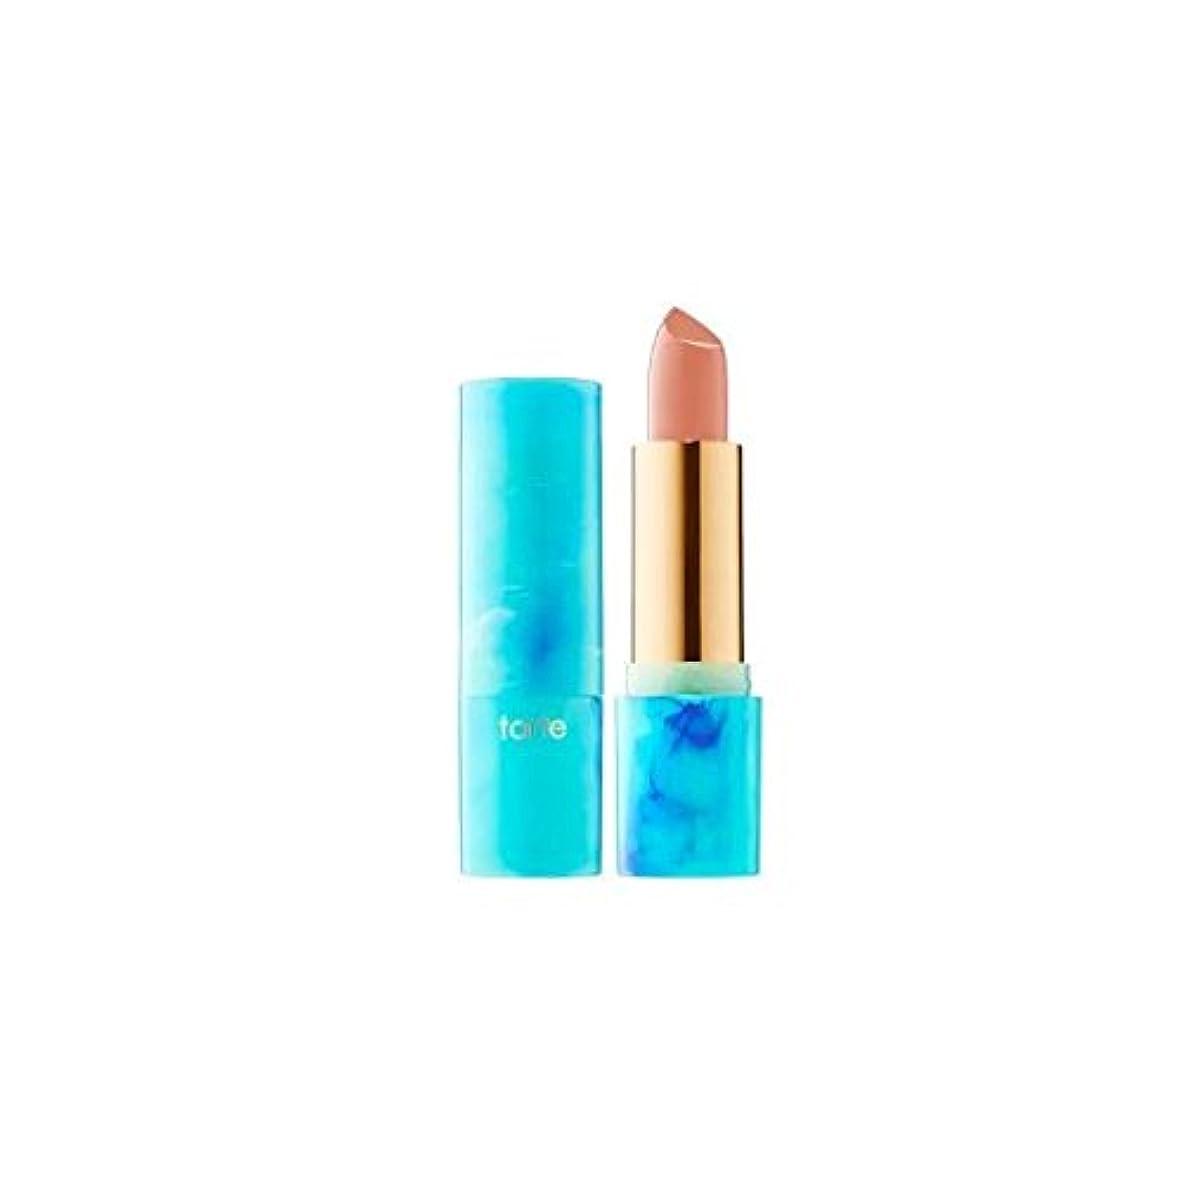 tarteタルト リップ Color Splash Lipstick - Rainforest of the Sea Collection Satin finish